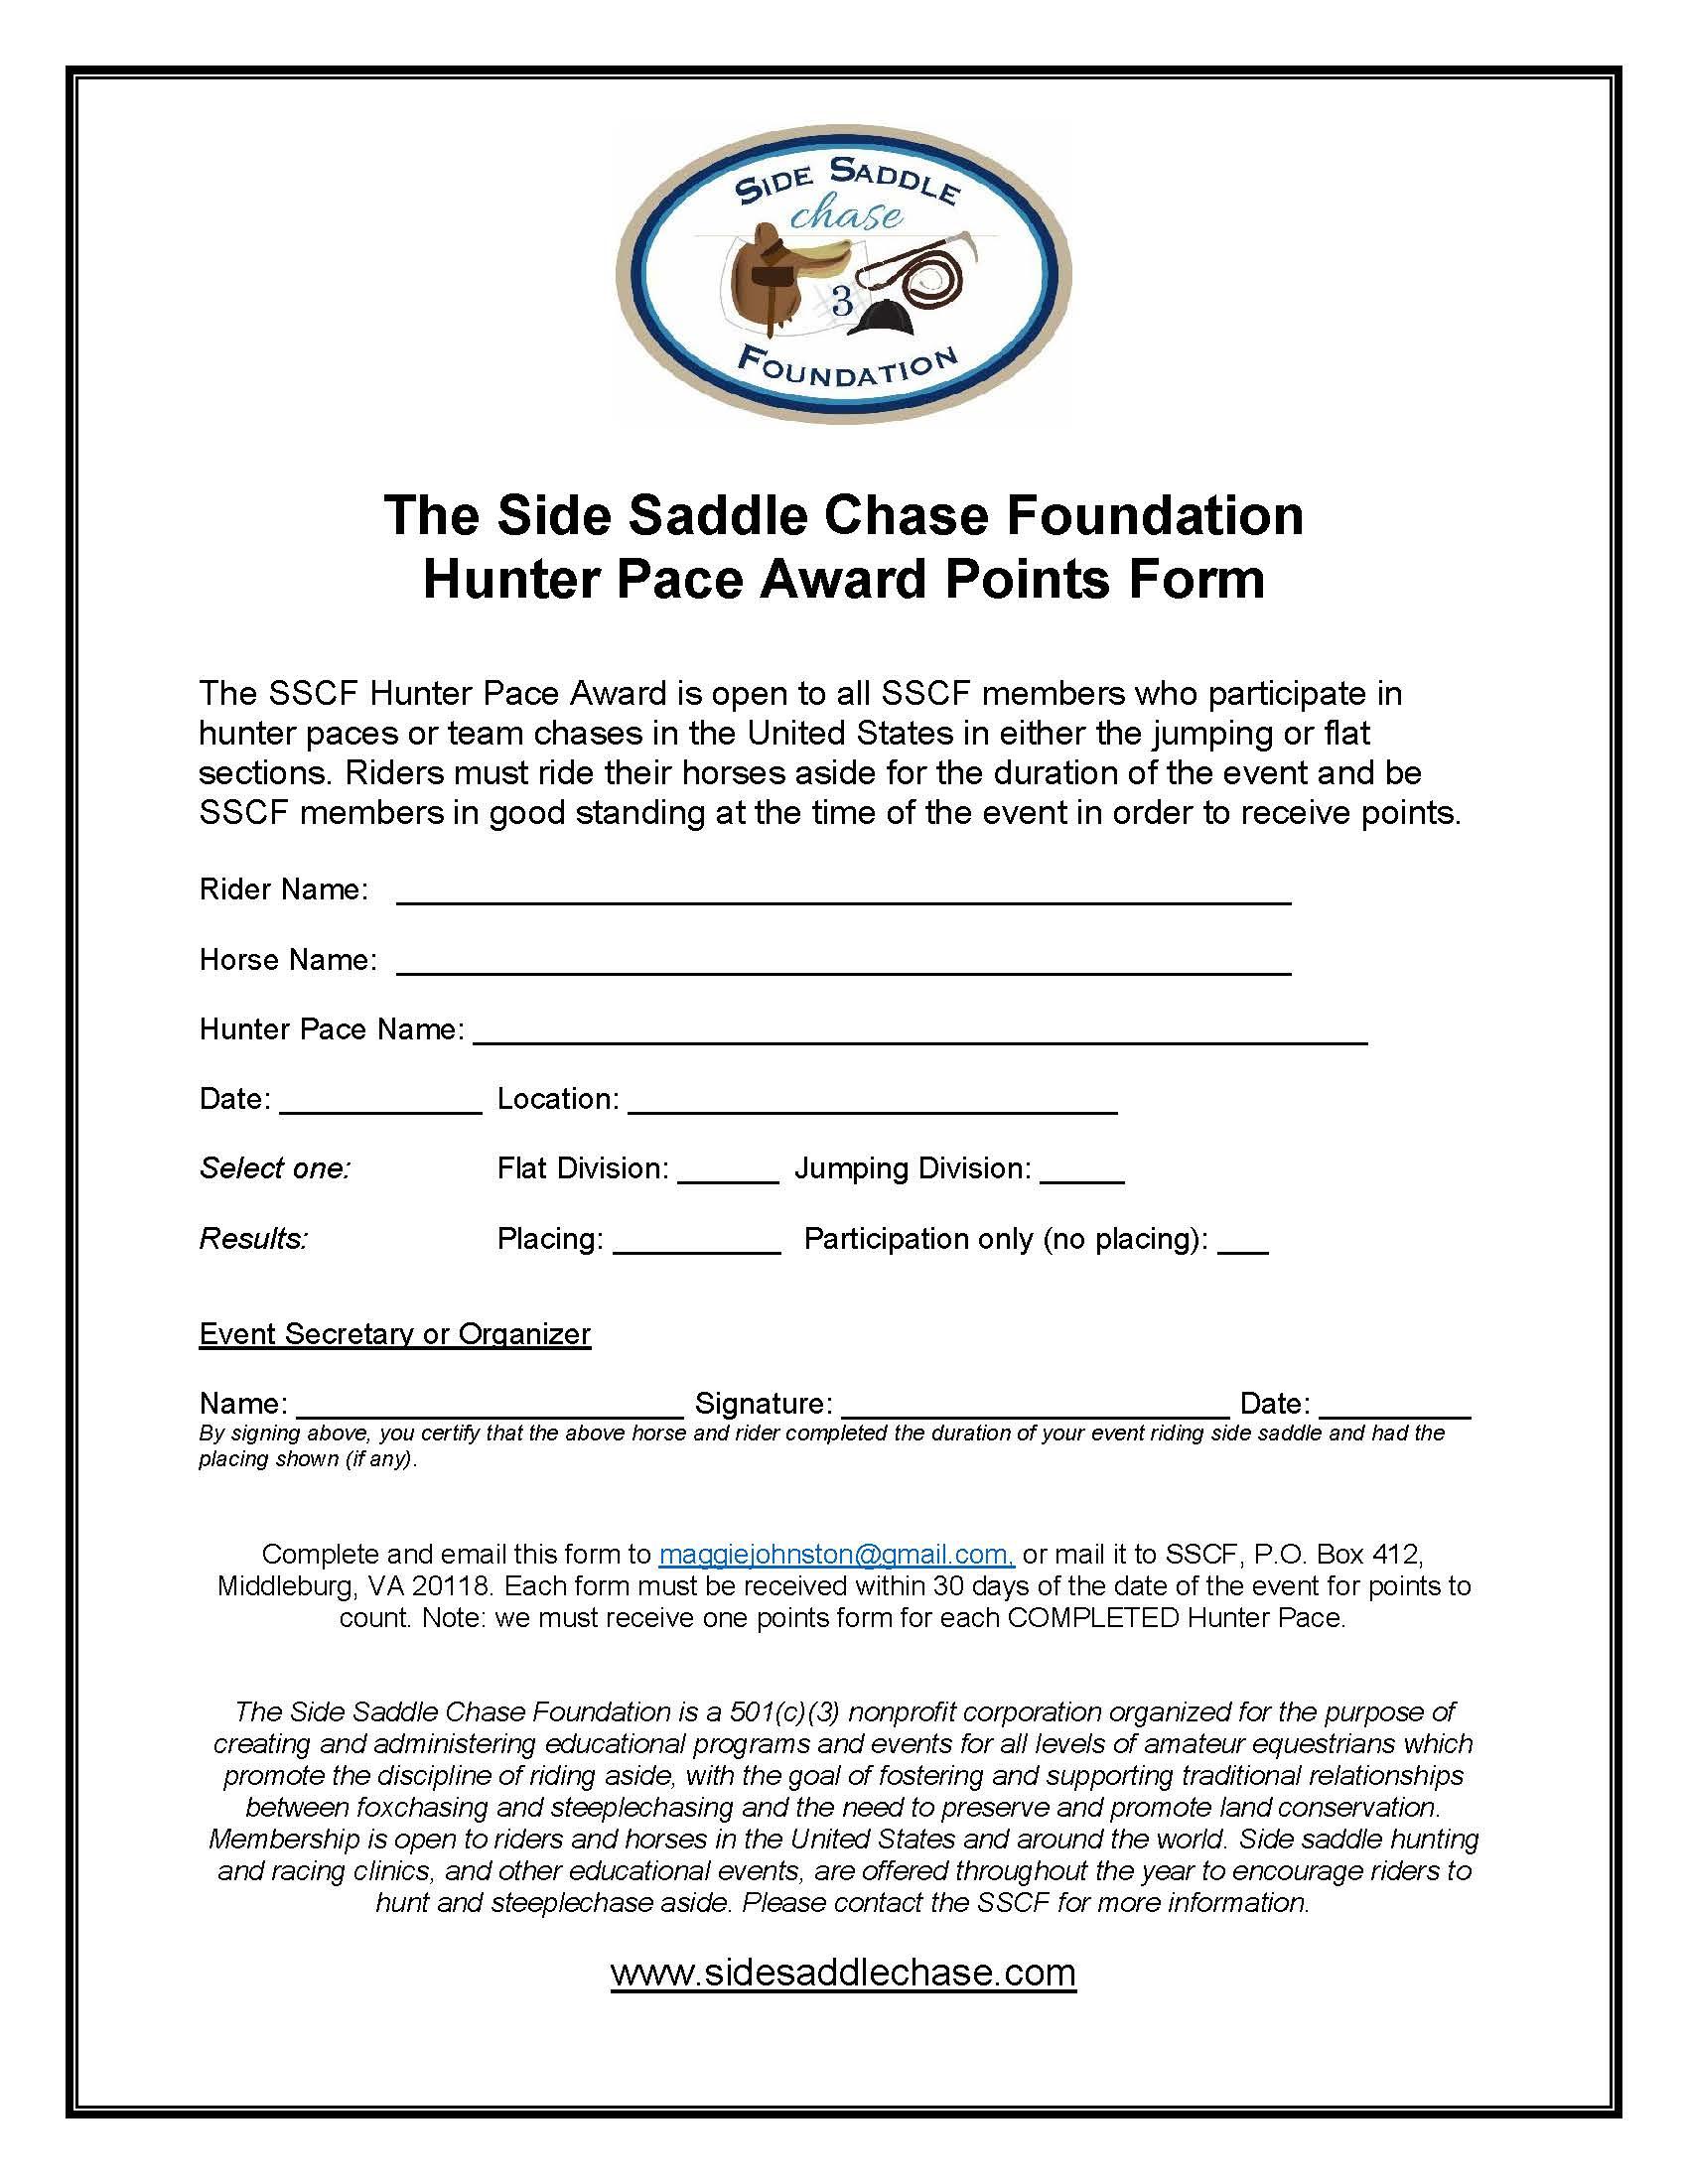 SSCF Hunter Pace Points Form_final.jpg